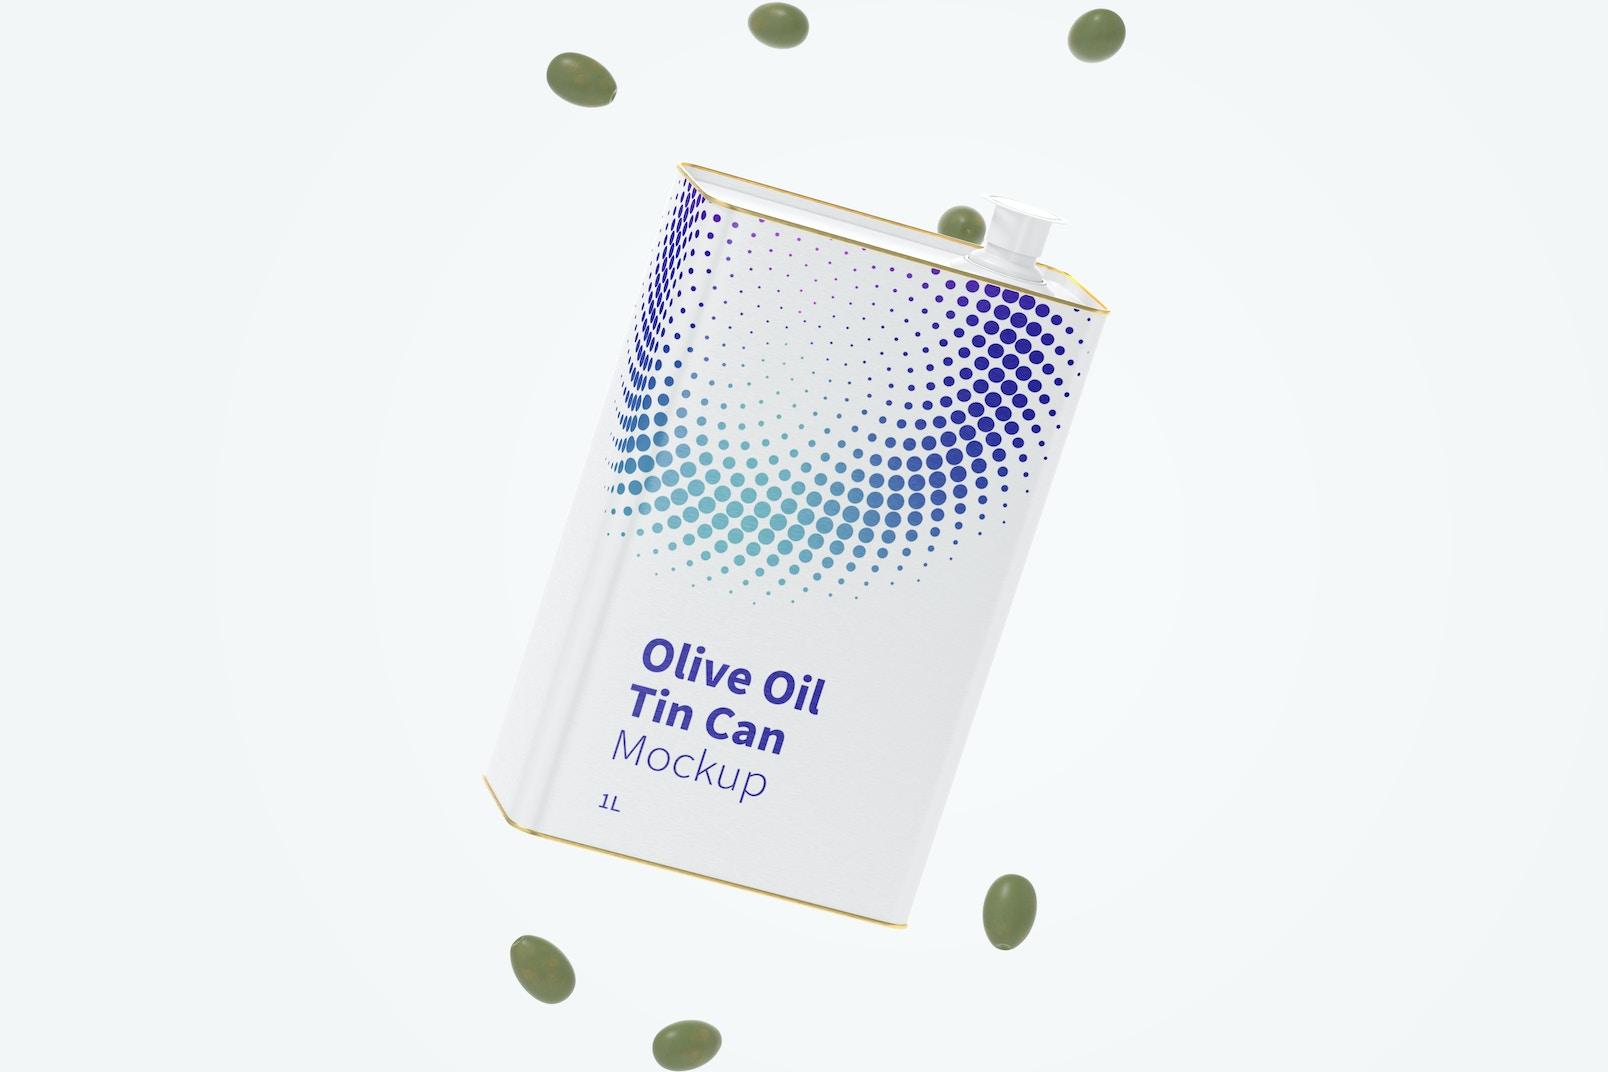 1 Liter Olive Oil Rectangular Tin Can Mockup, Floating